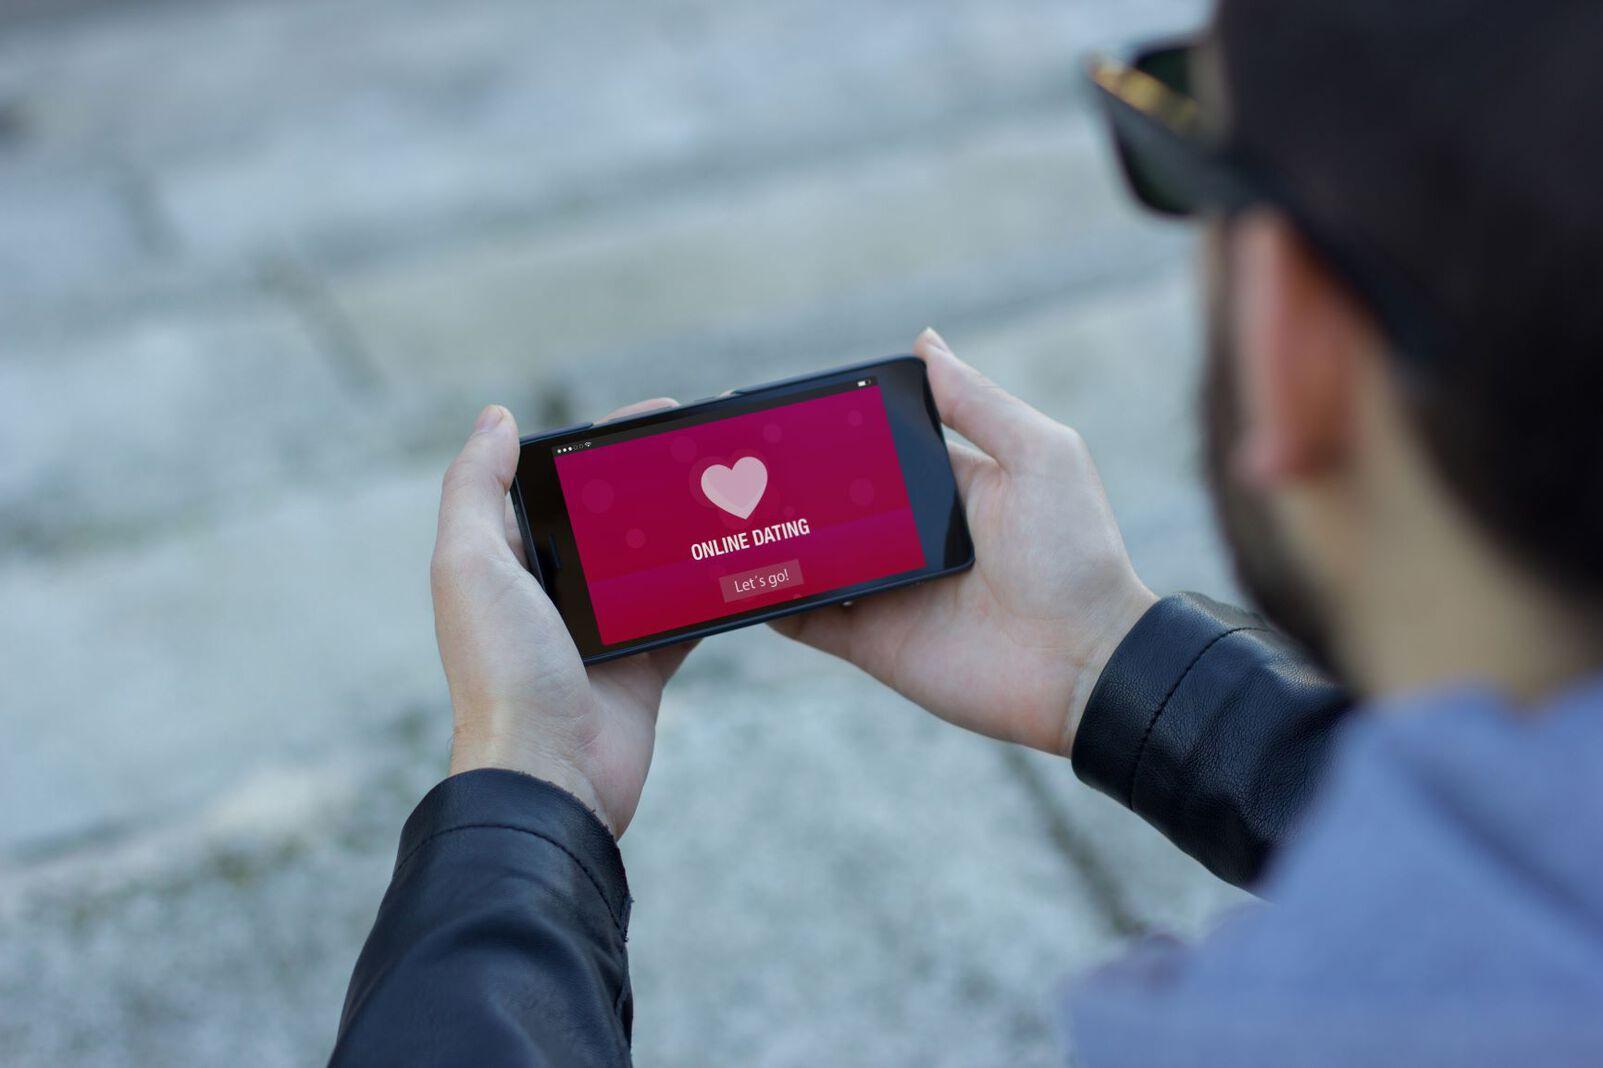 Online Dating Mann Handy Smartphone